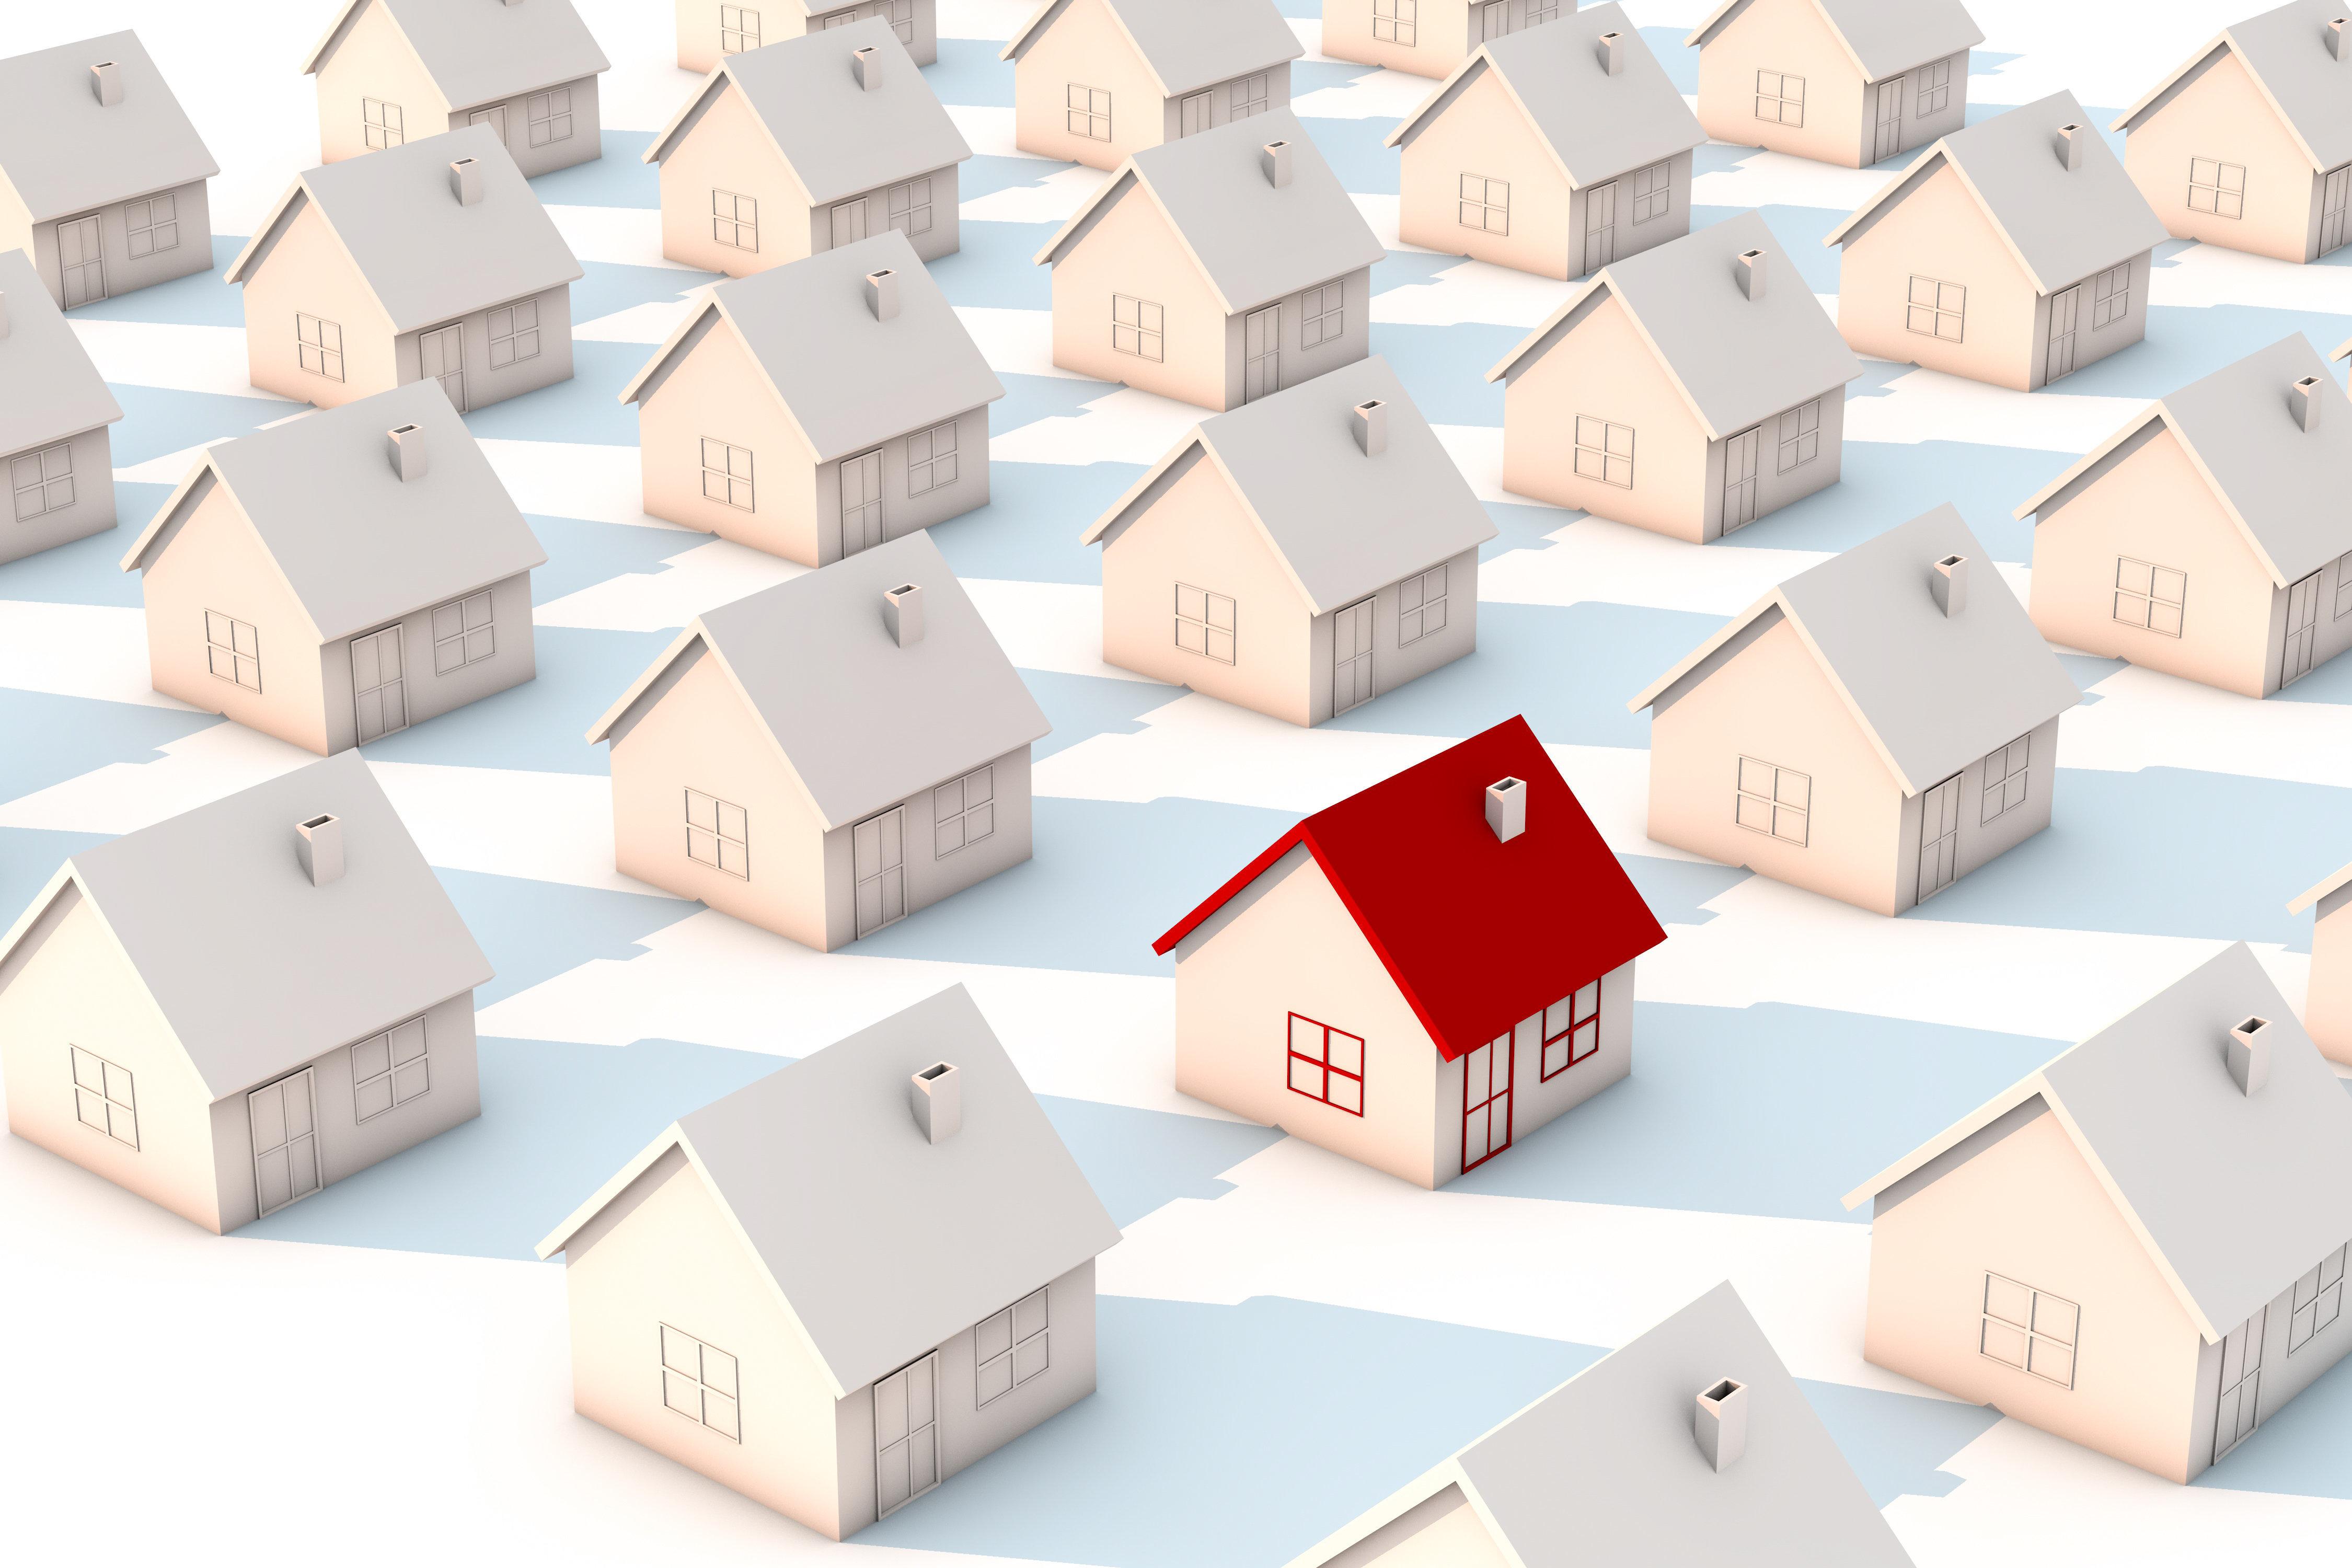 6 Reasons People Love To Hate Homeowners